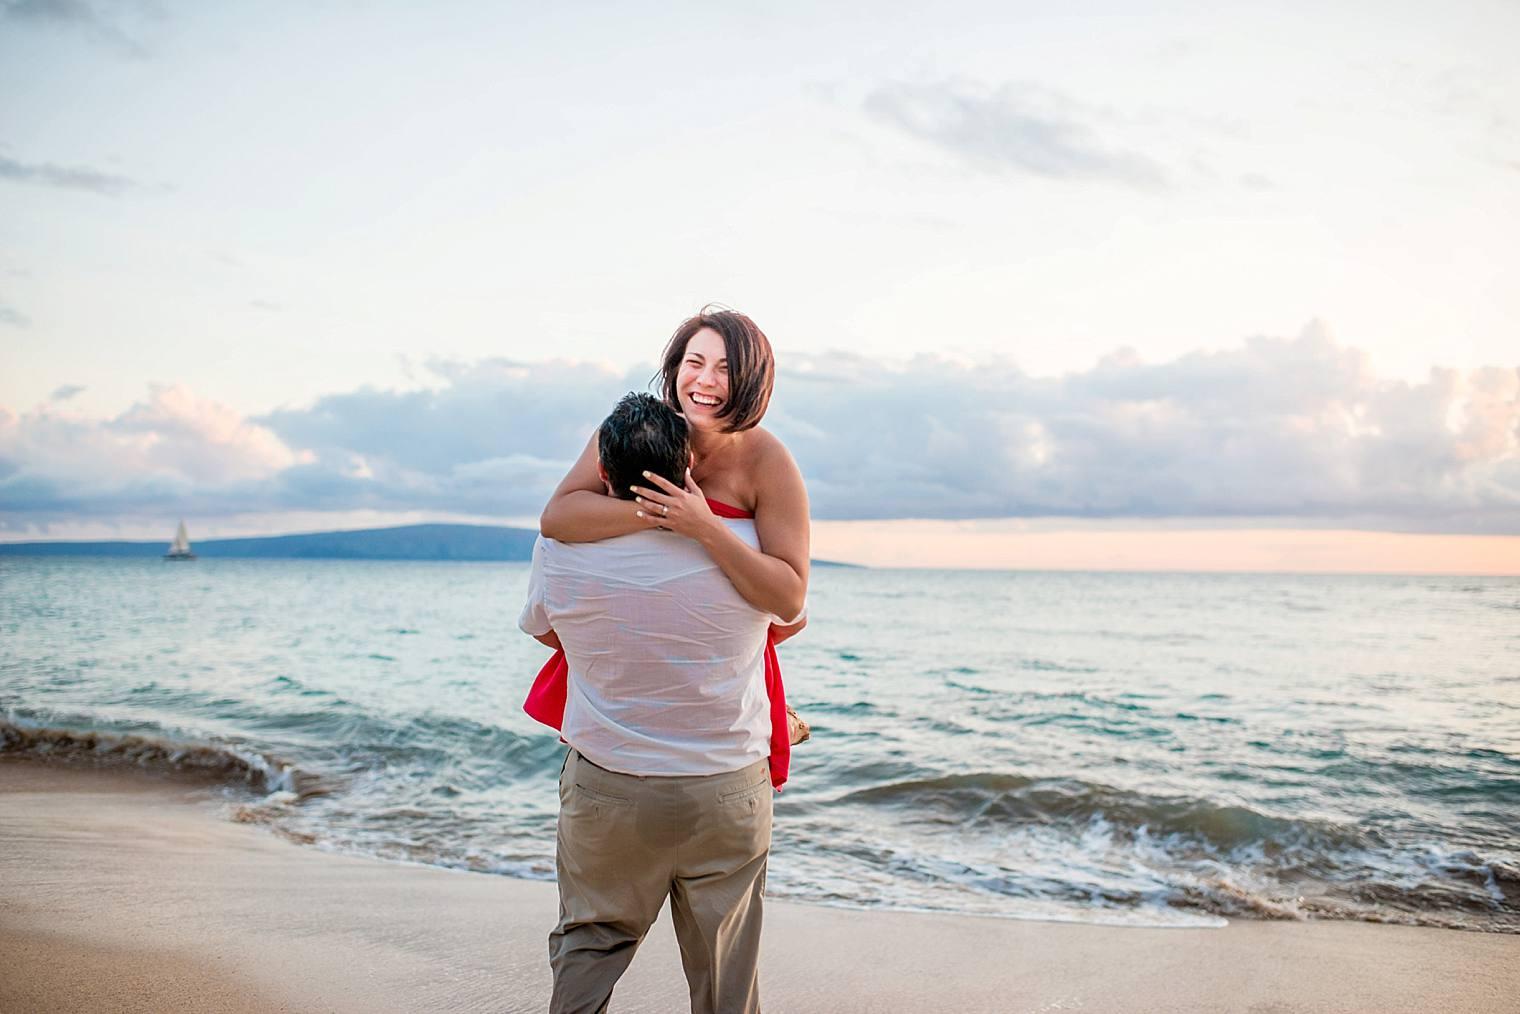 man picking up fiance on beach